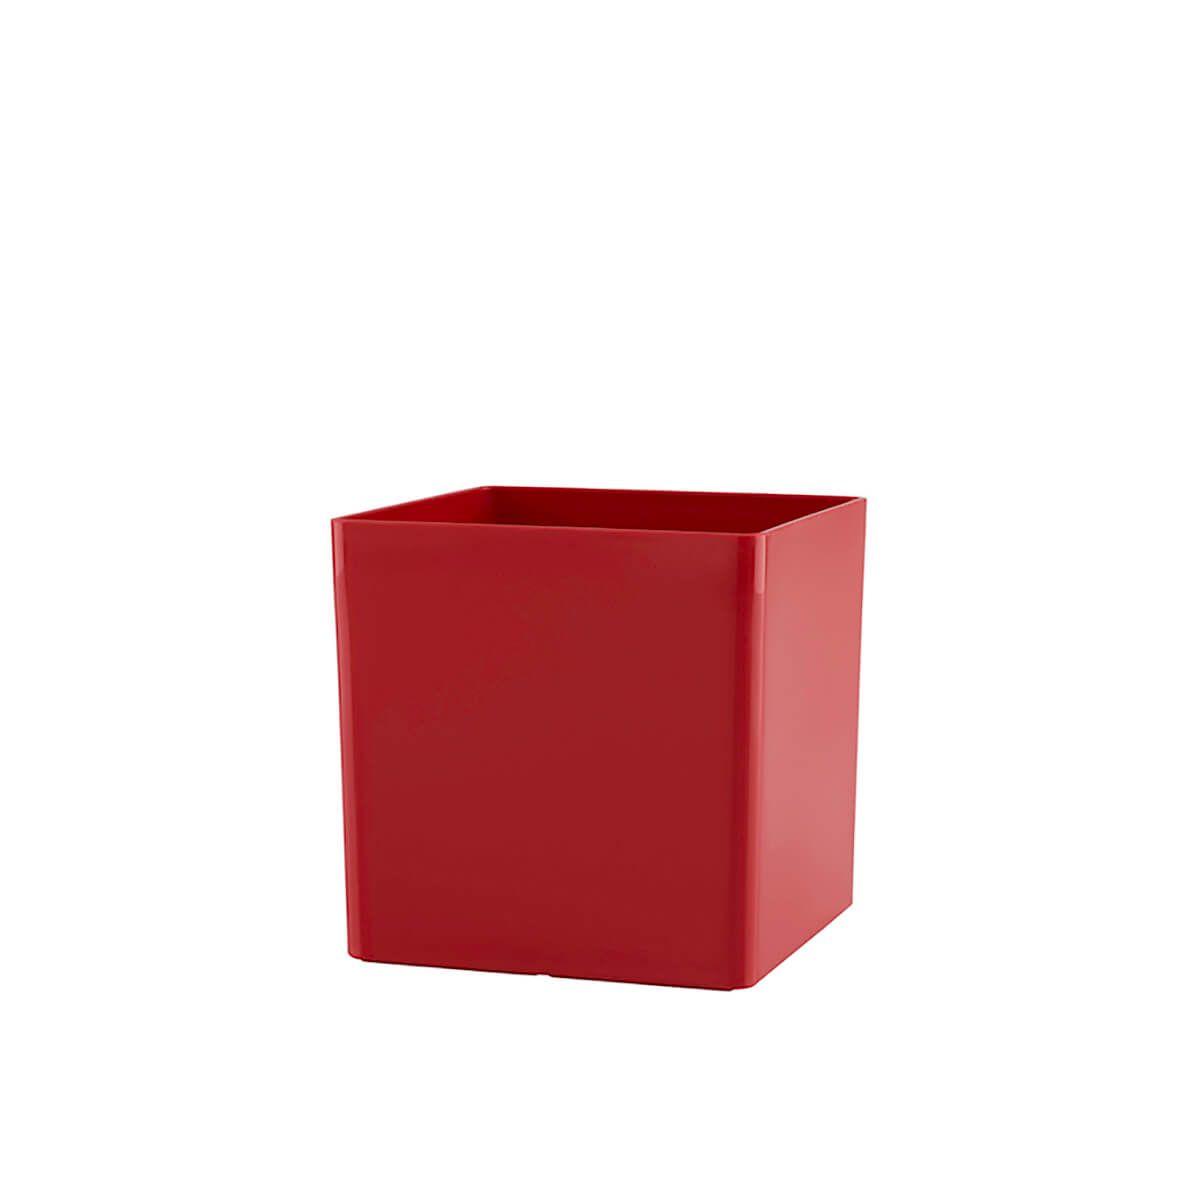 Vaso Cubo 10 x 10 cm Vermelho Vasart